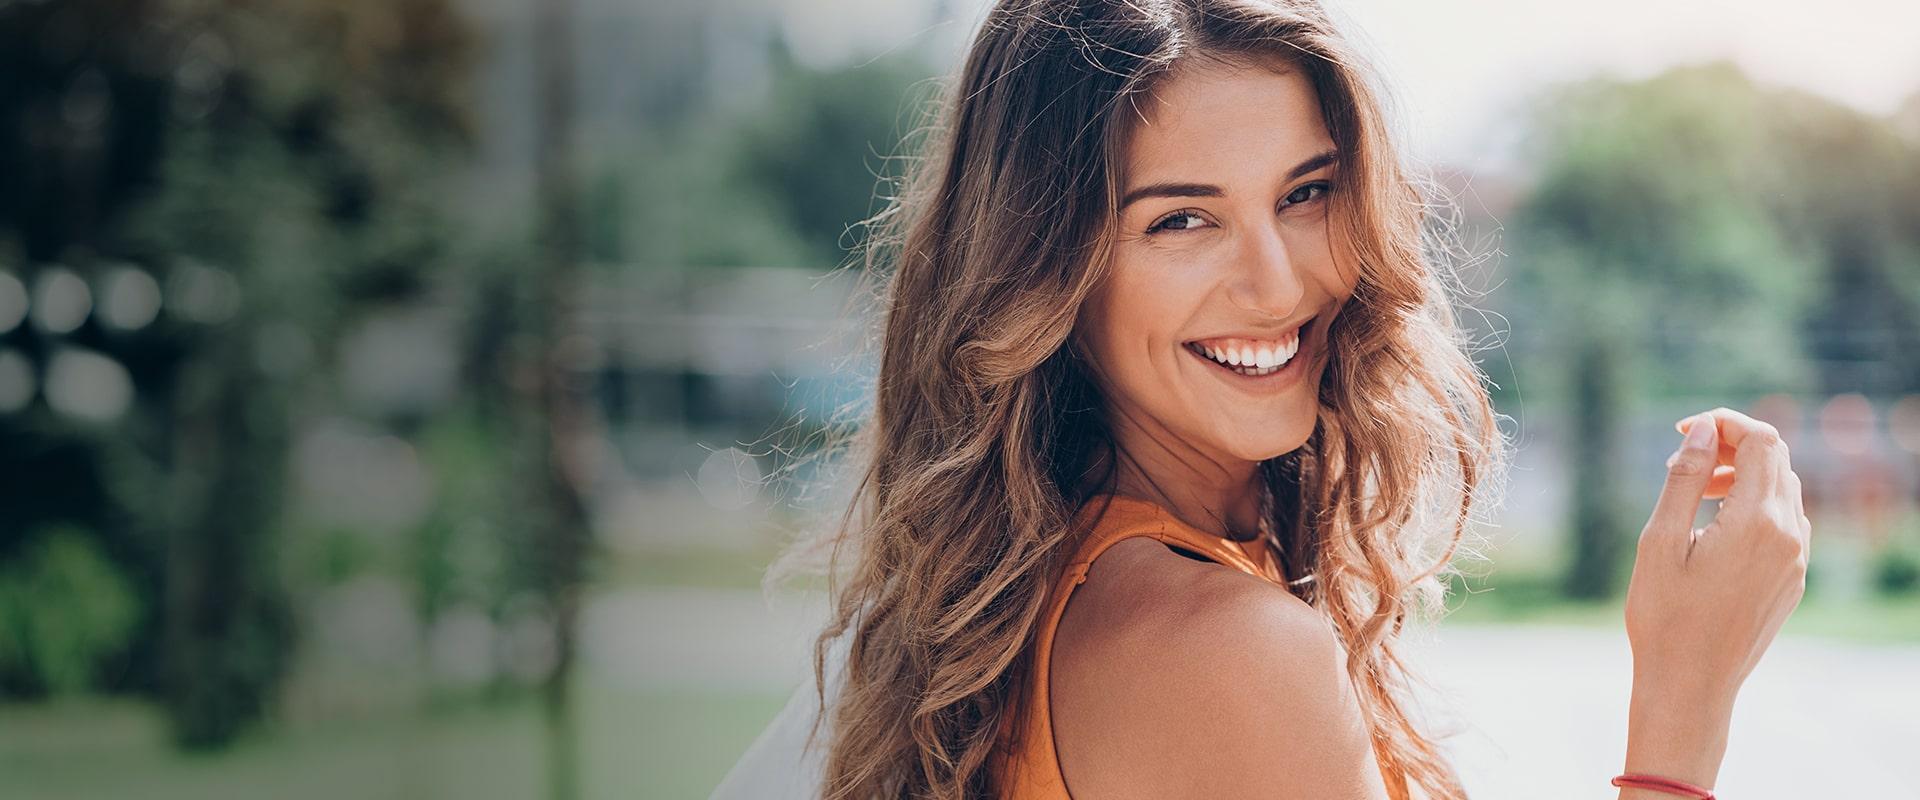 Foto de una chica sonriendo